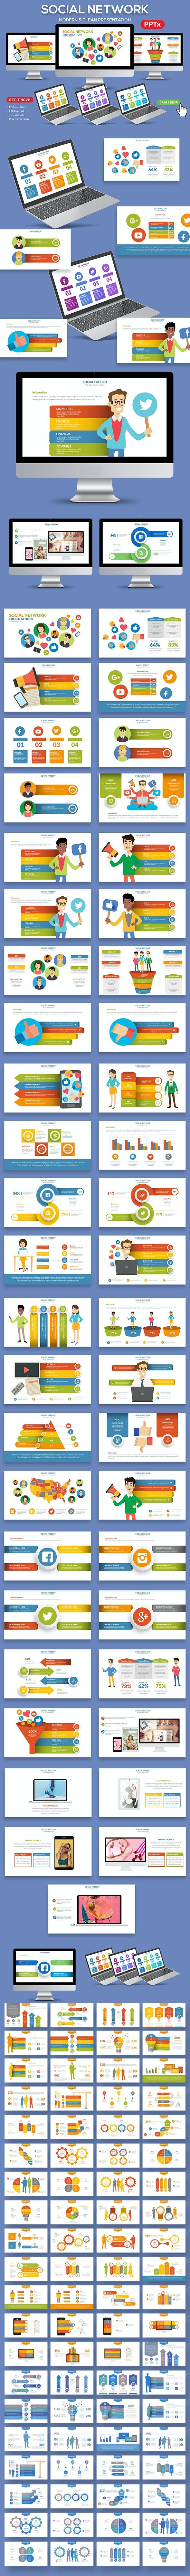 Social Network Powerpoint Presentation - PowerPoint Templates Presentation Templates